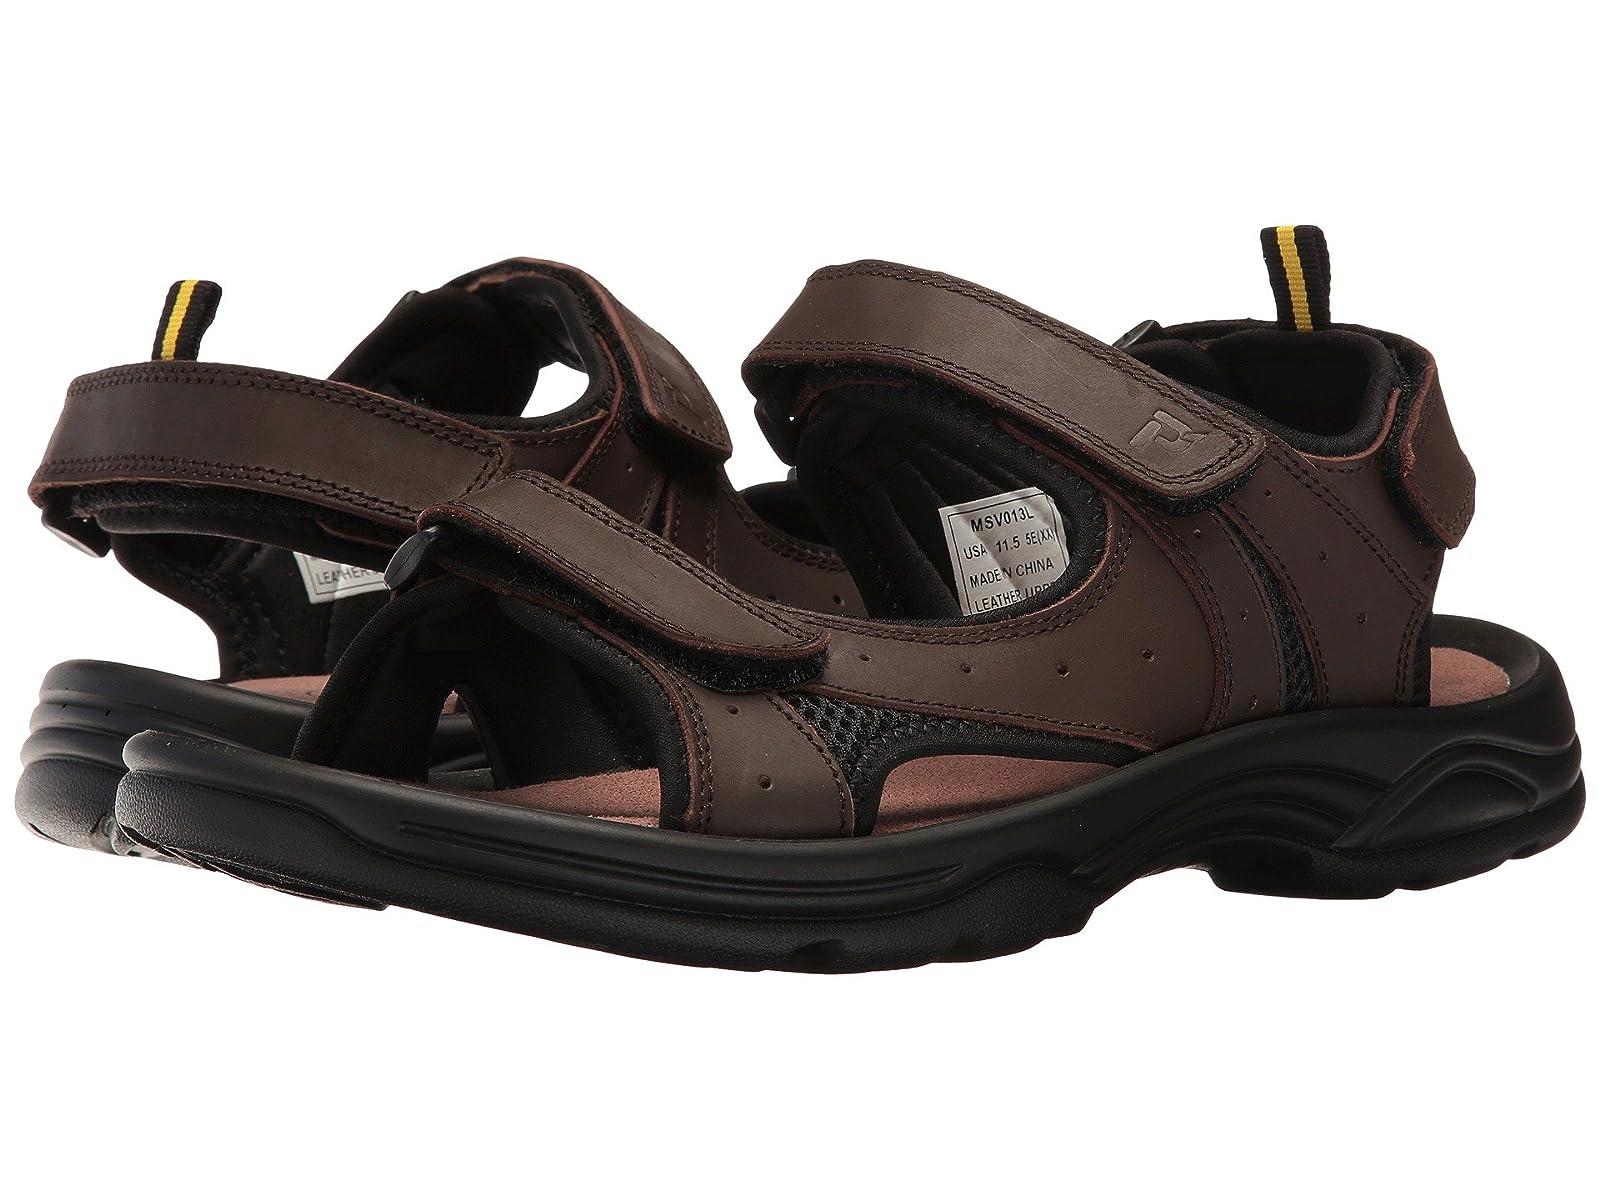 Propet DaytonaAtmospheric grades have affordable shoes